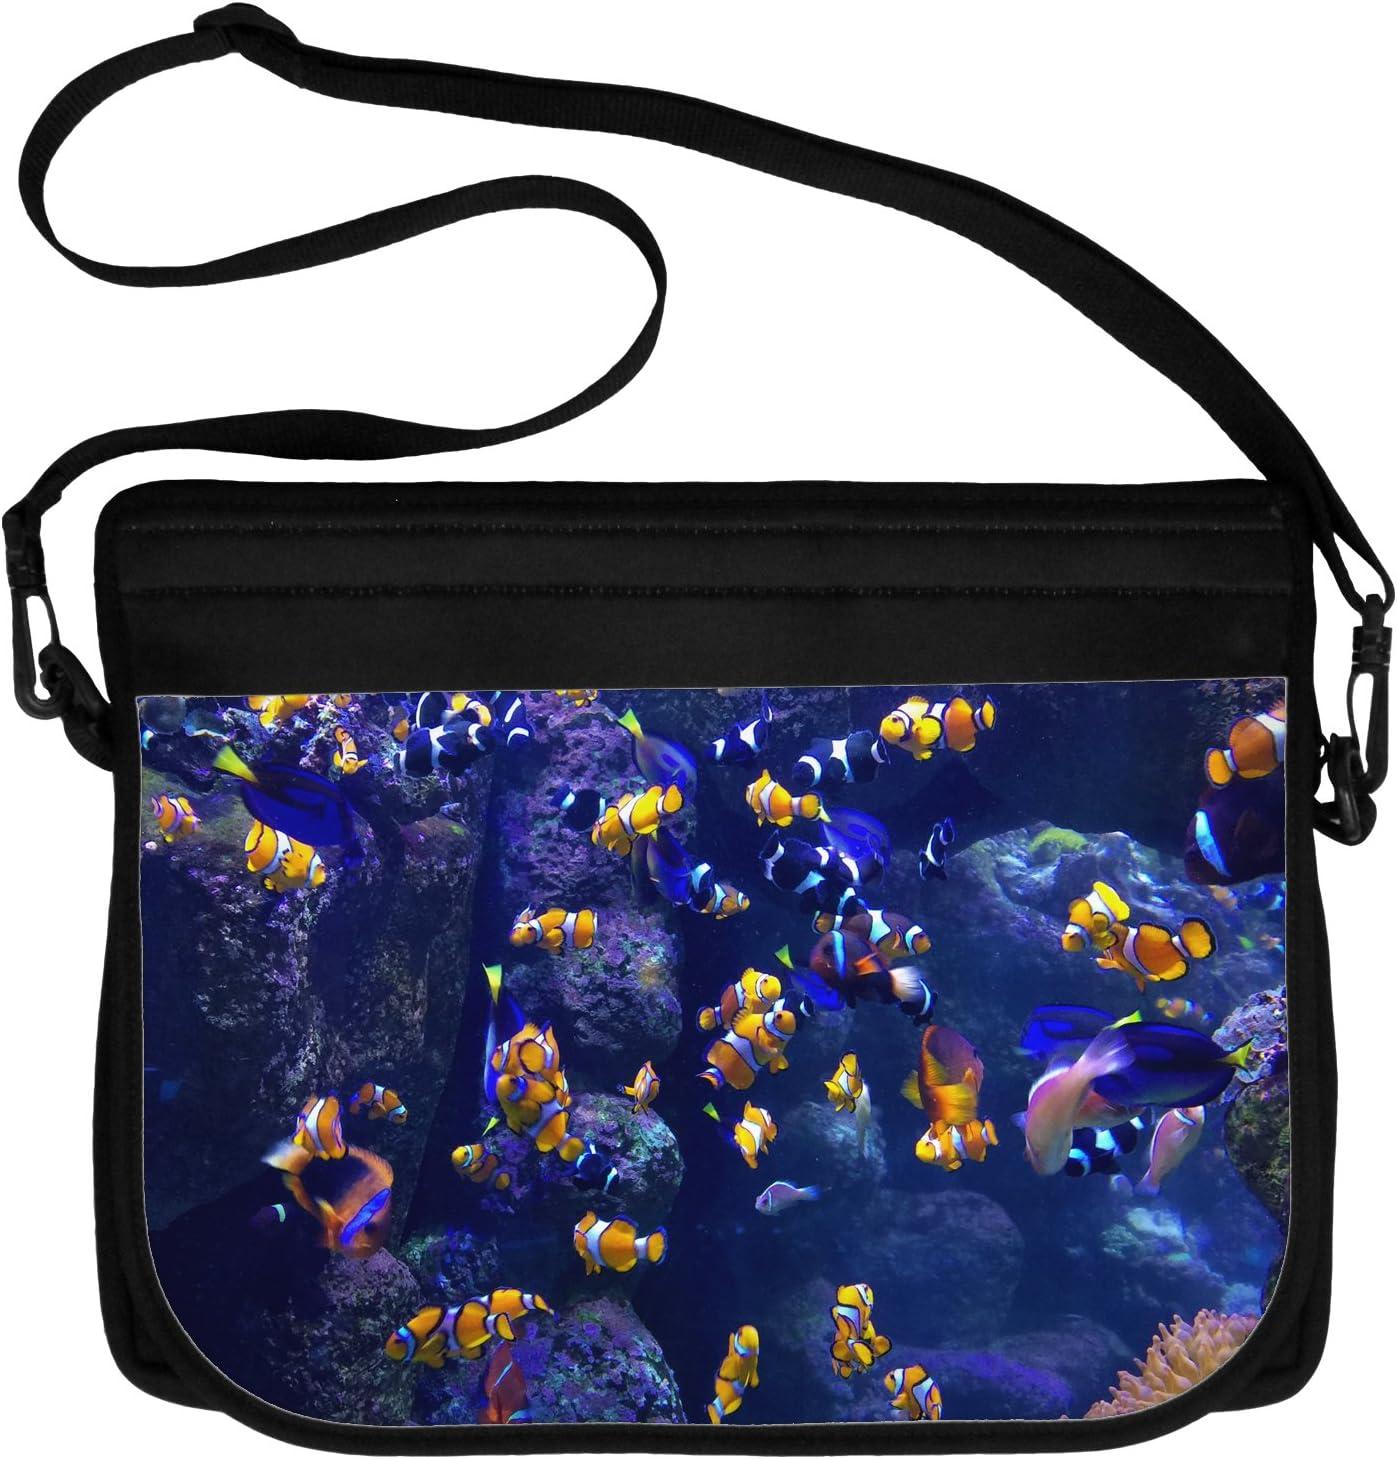 TooLoud Underwater Ocean View Clownfish Neoprene Laptop Shoulder Bag All Over Print